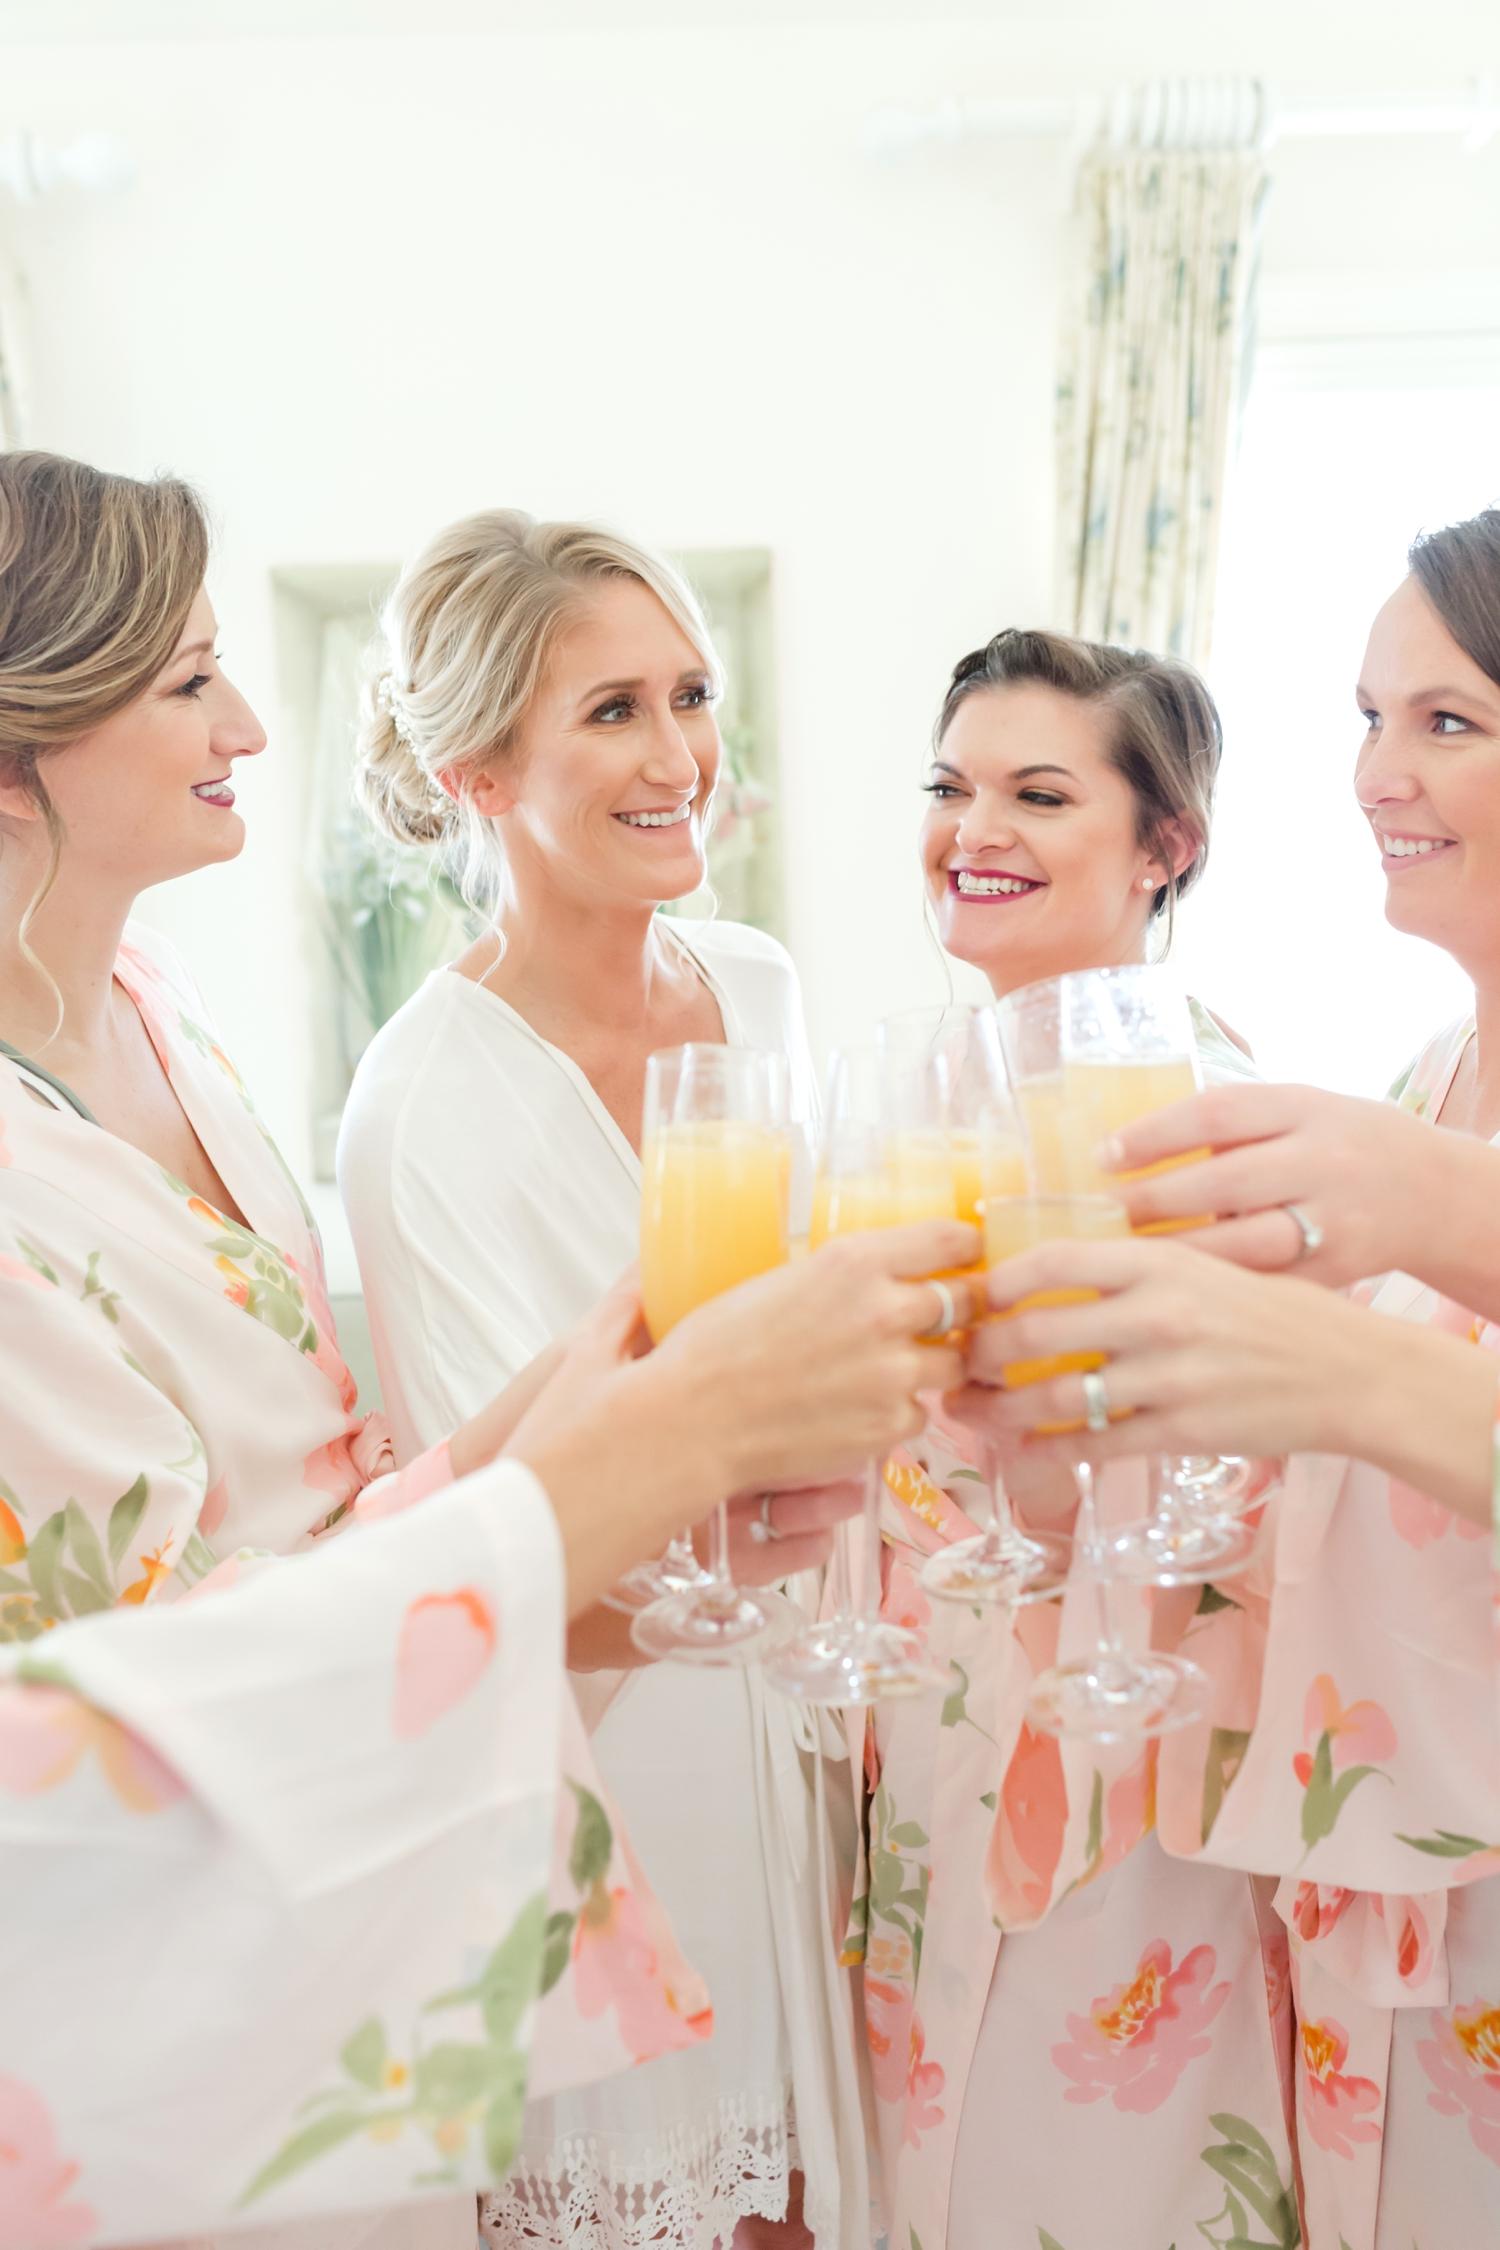 Wojciechowski Wedding-101_the-oaks-waterfront-inn-wedding-easton-maryland-wedding-photography-anna-grace-photography-photo.jpg